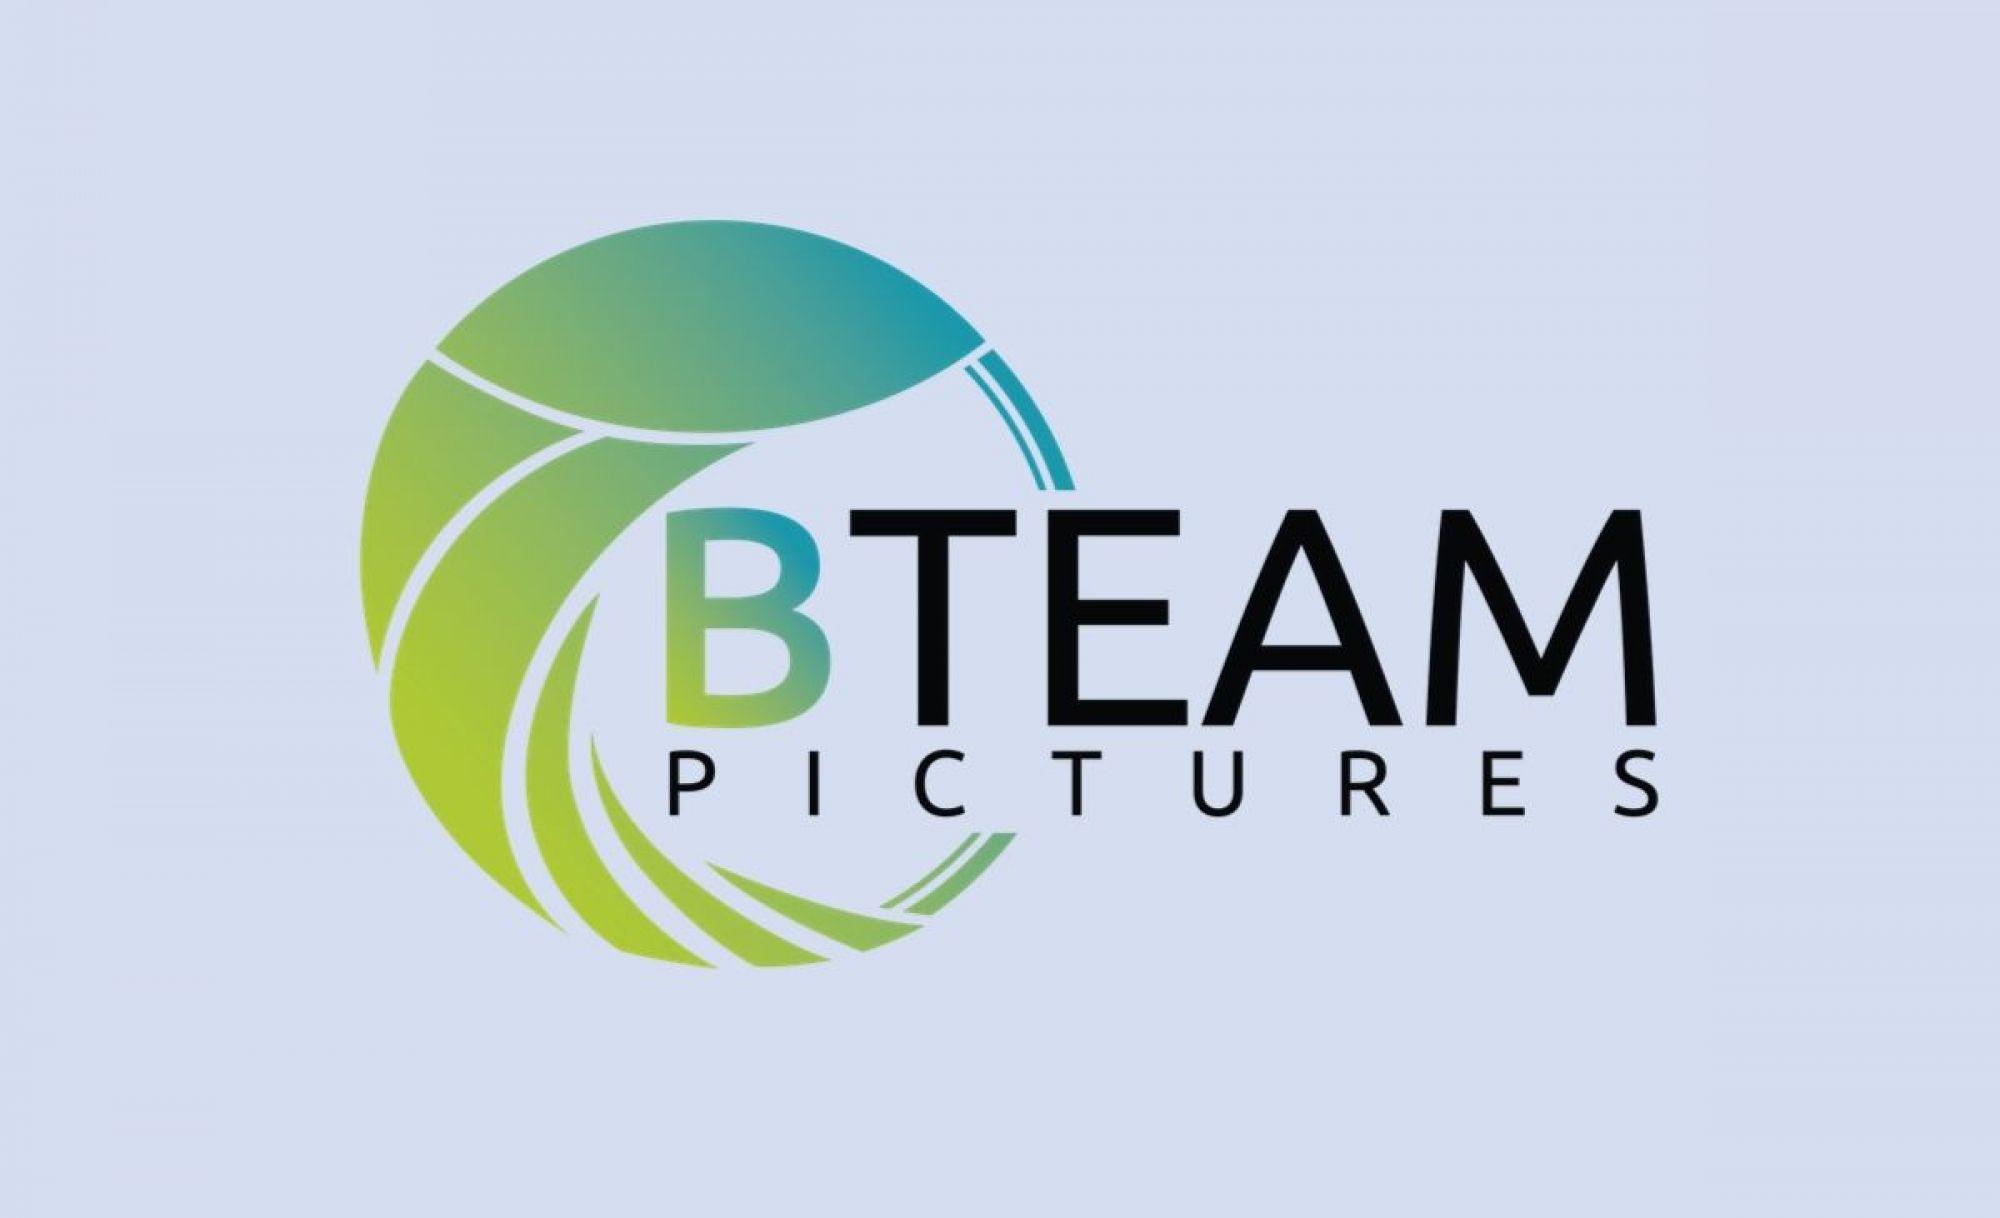 Bteam_Pictures1